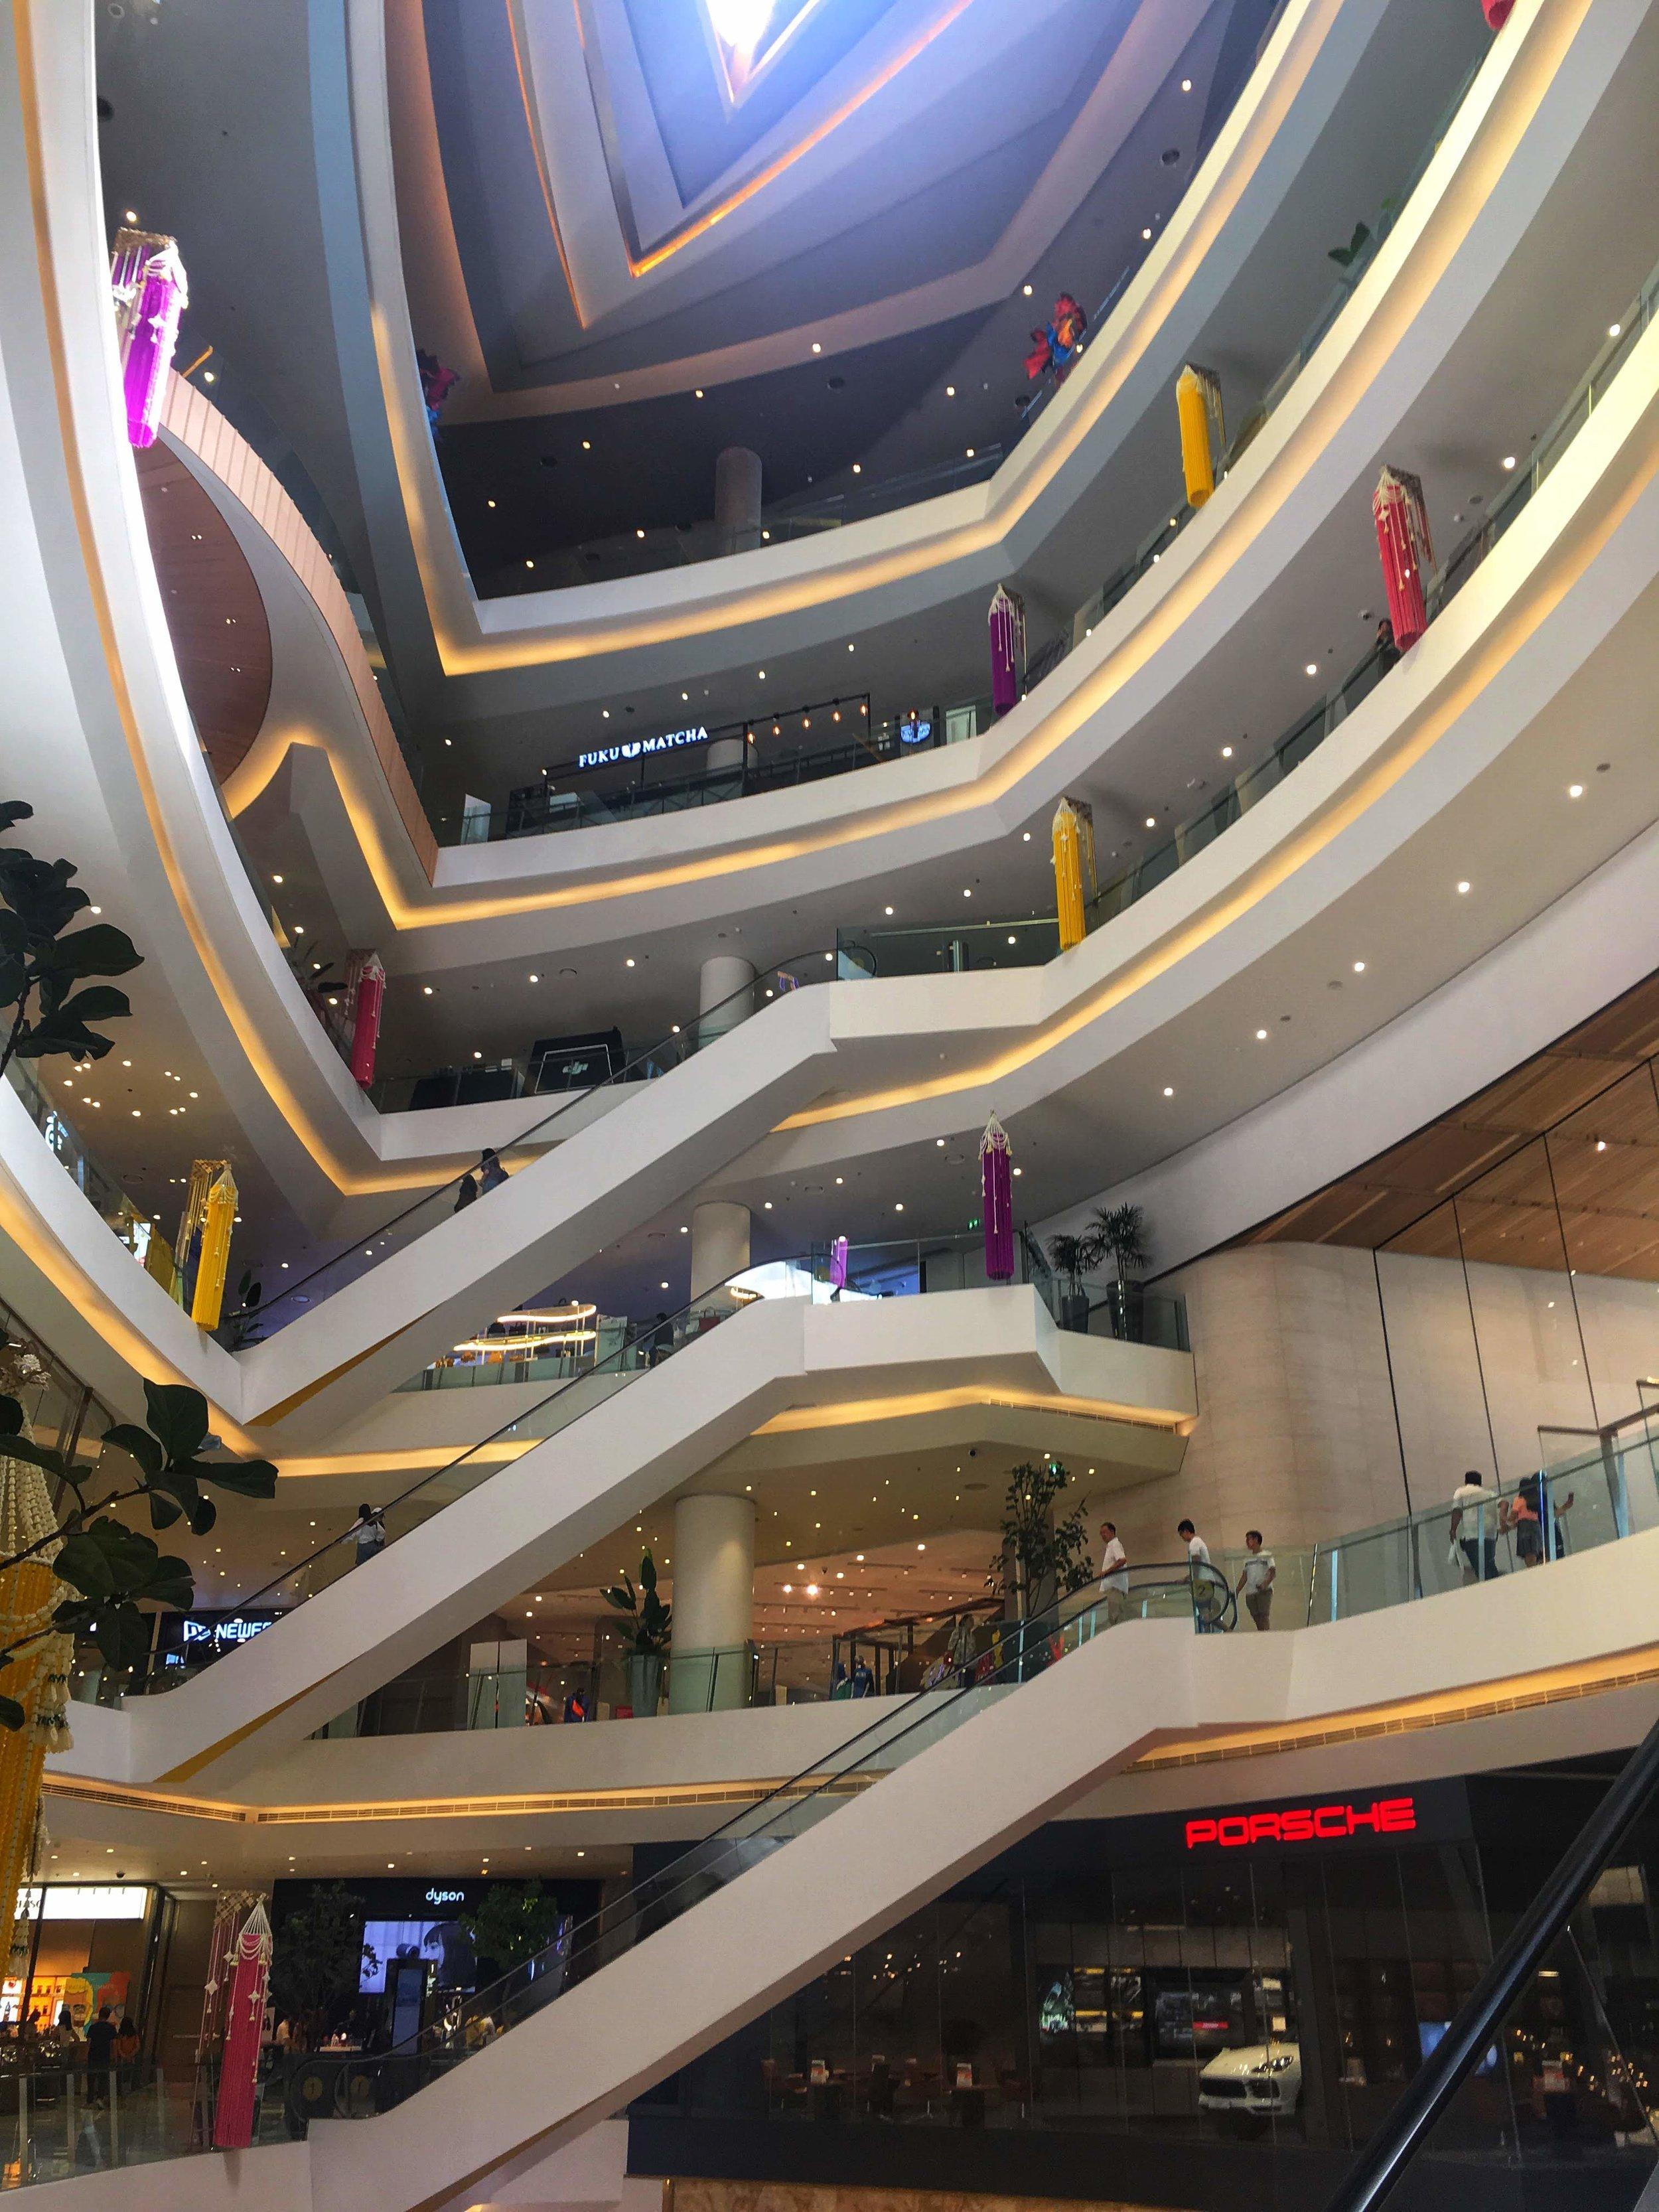 multi-story IconSiam shopping mall